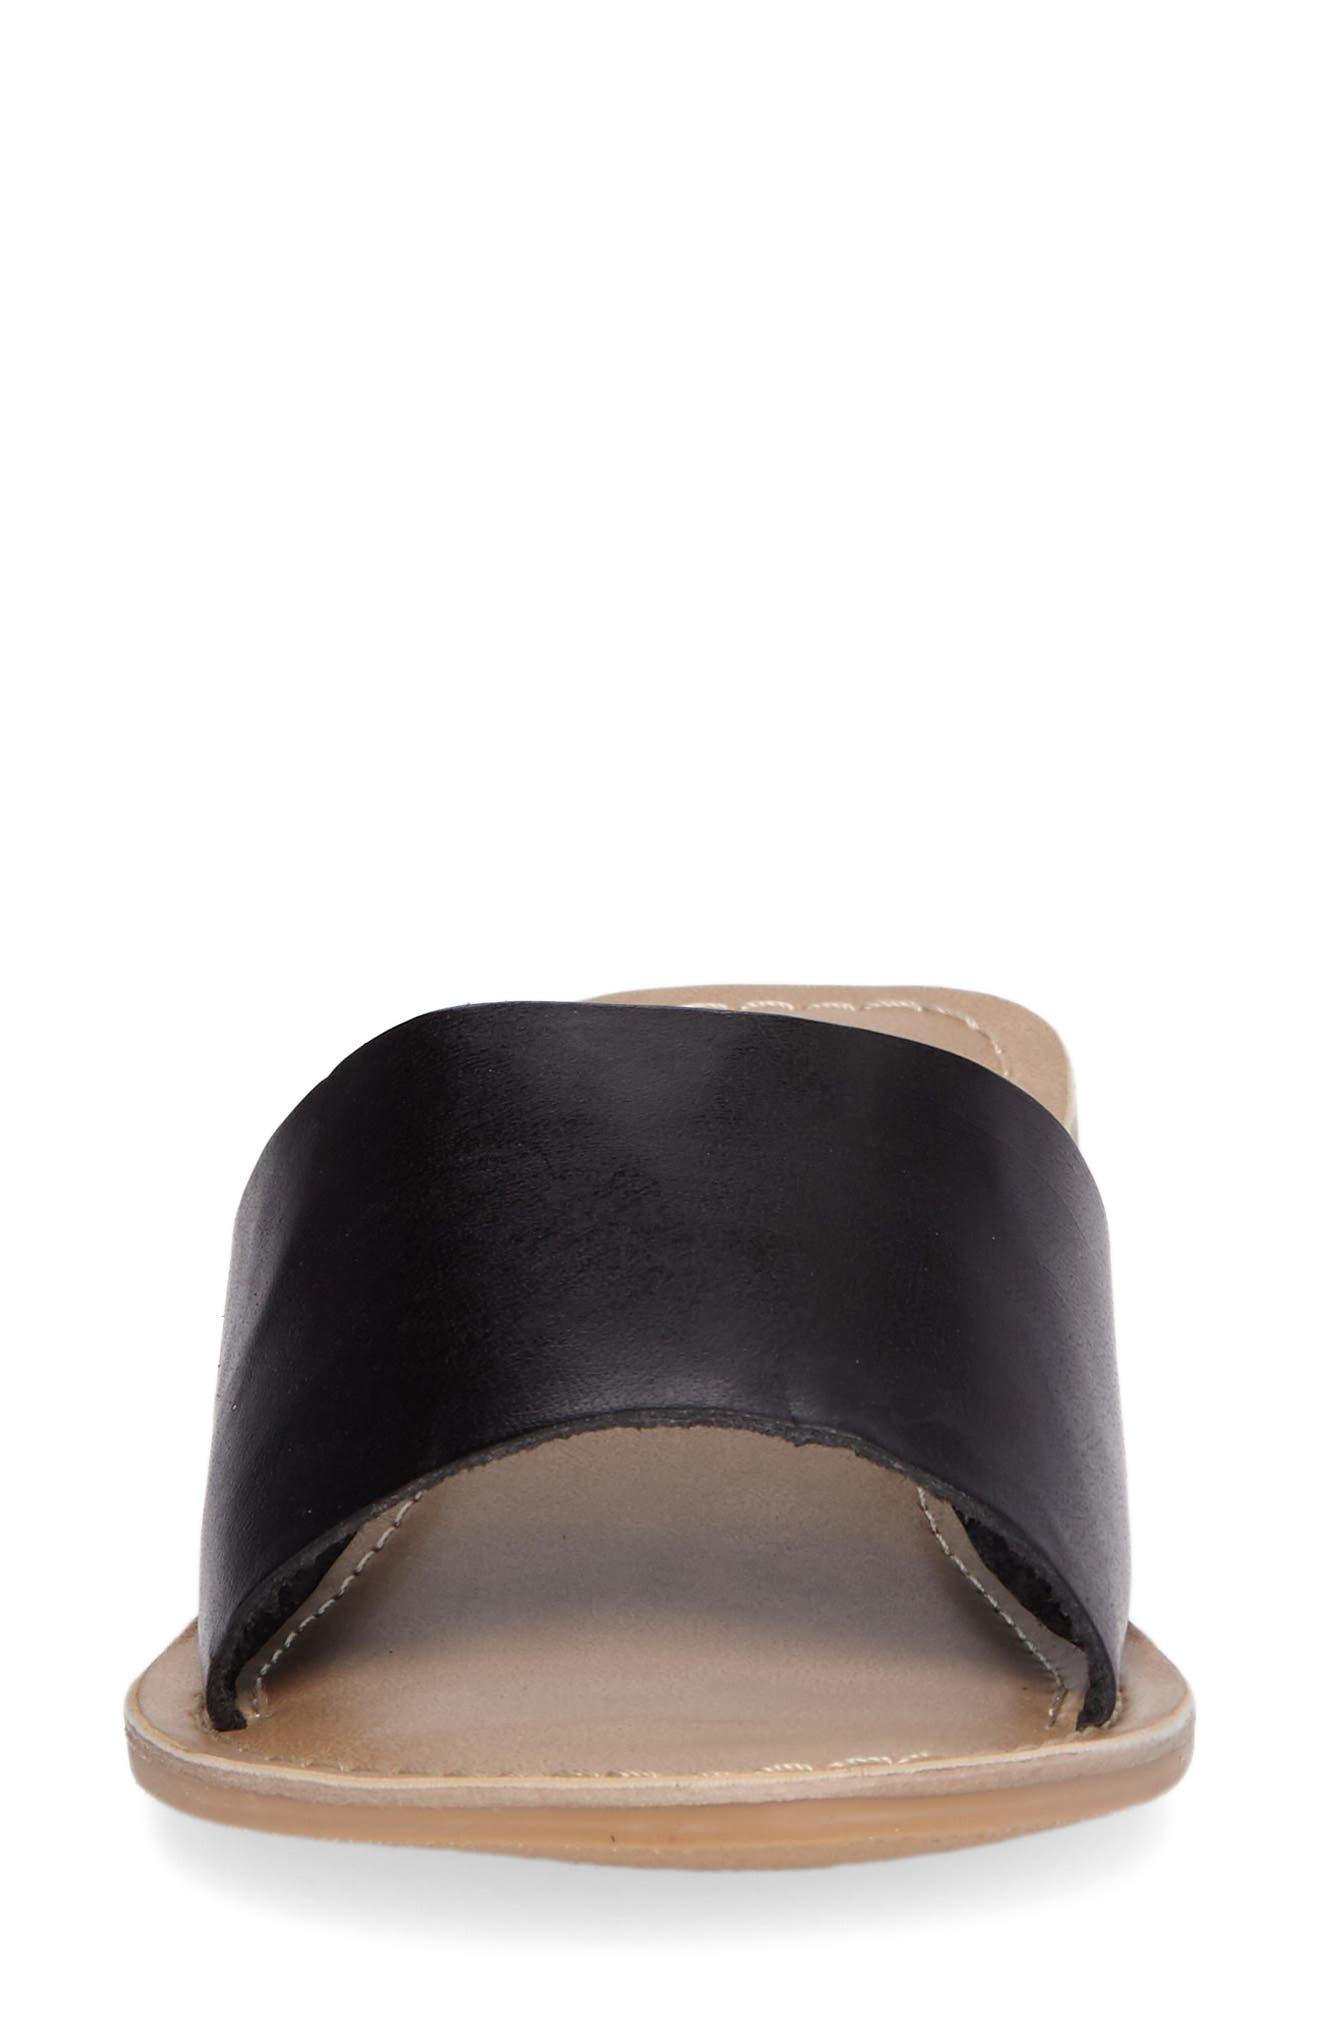 COCONUTS BY MATISSE, Cabana Genuine Calf Hair Slide Sandal, Alternate thumbnail 4, color, 001